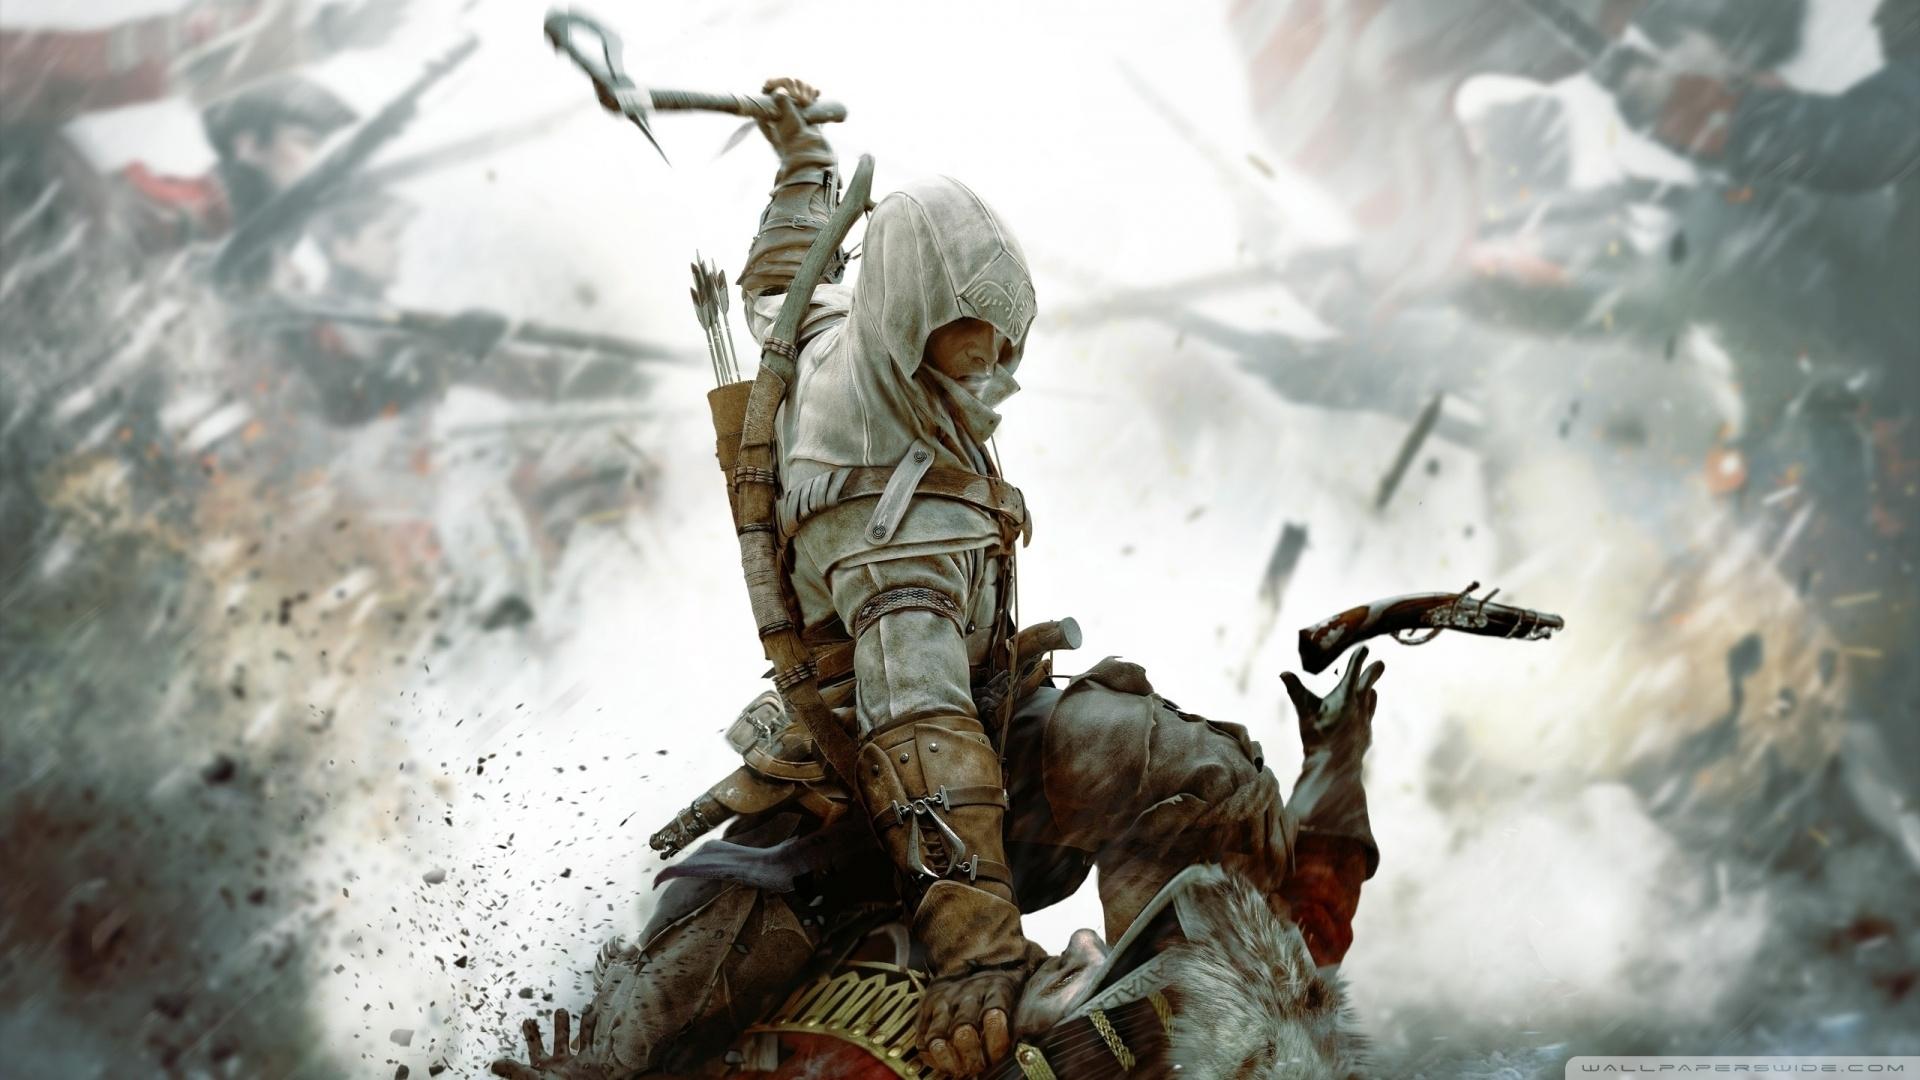 assassins creed iii ❤ 4k hd desktop wallpaper for 4k ultra hd tv